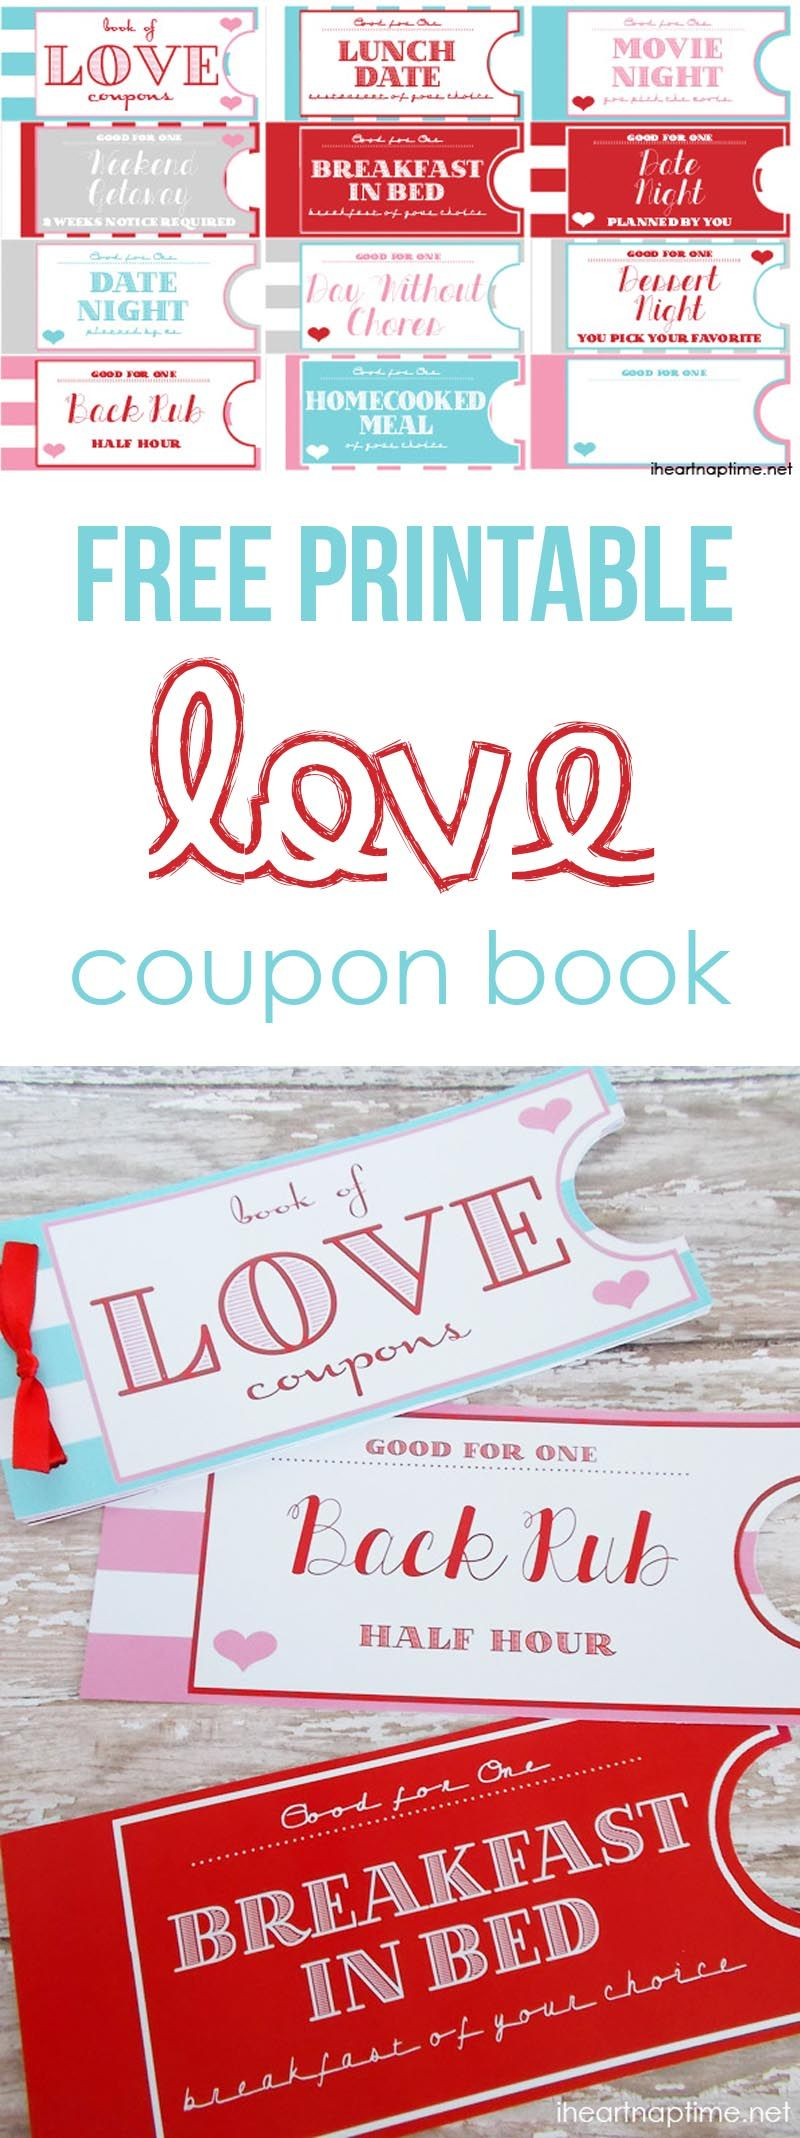 Printable Love Coupon Book The Perfect Valentine S Day Gift Love Coupons Coupon Book Valentines Diy